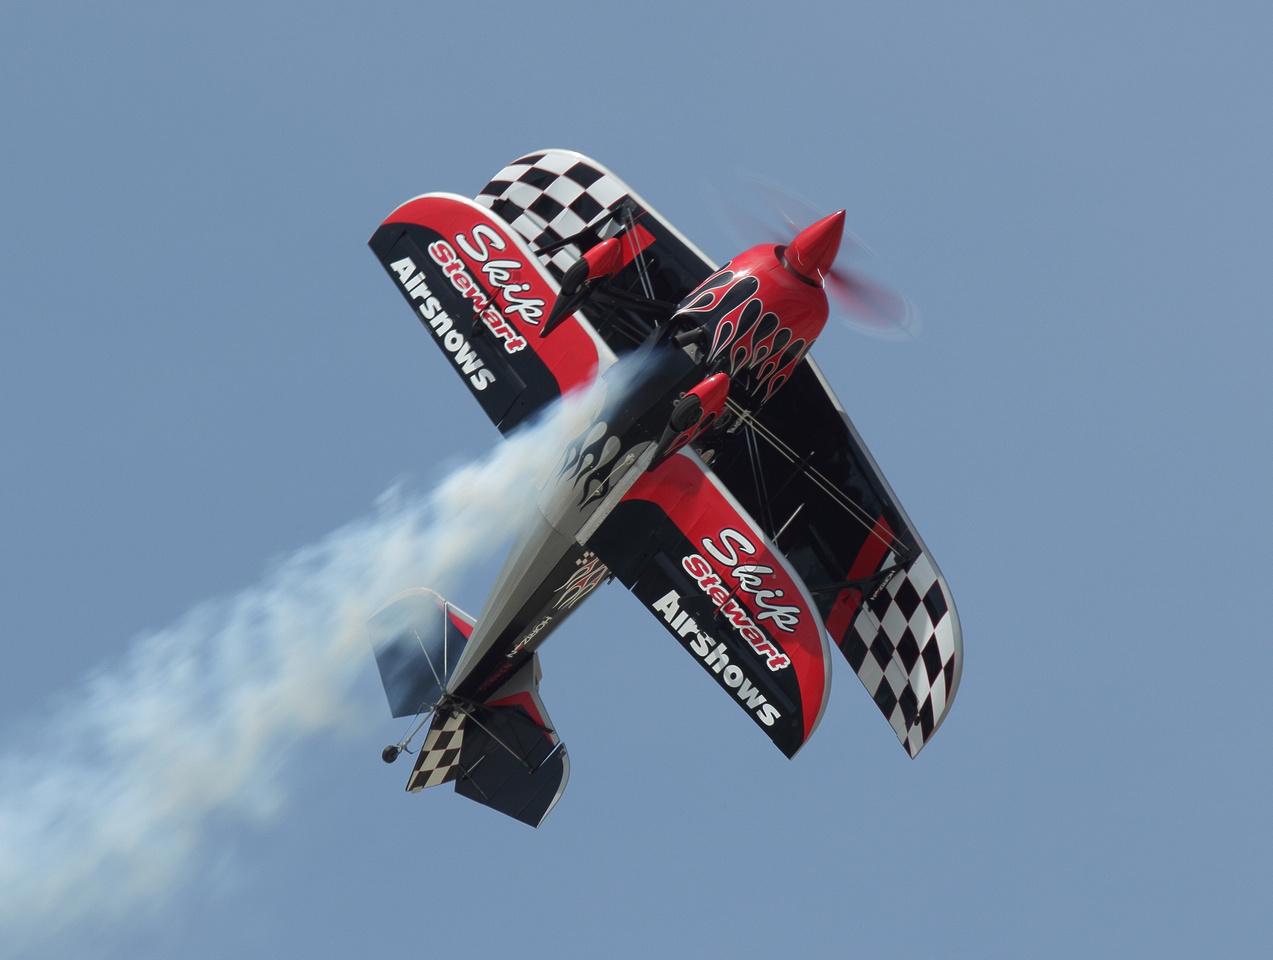 IMAGE: http://flightlinephotos.zenfolio.com/img/s3/v45/p1953114980-6.jpg